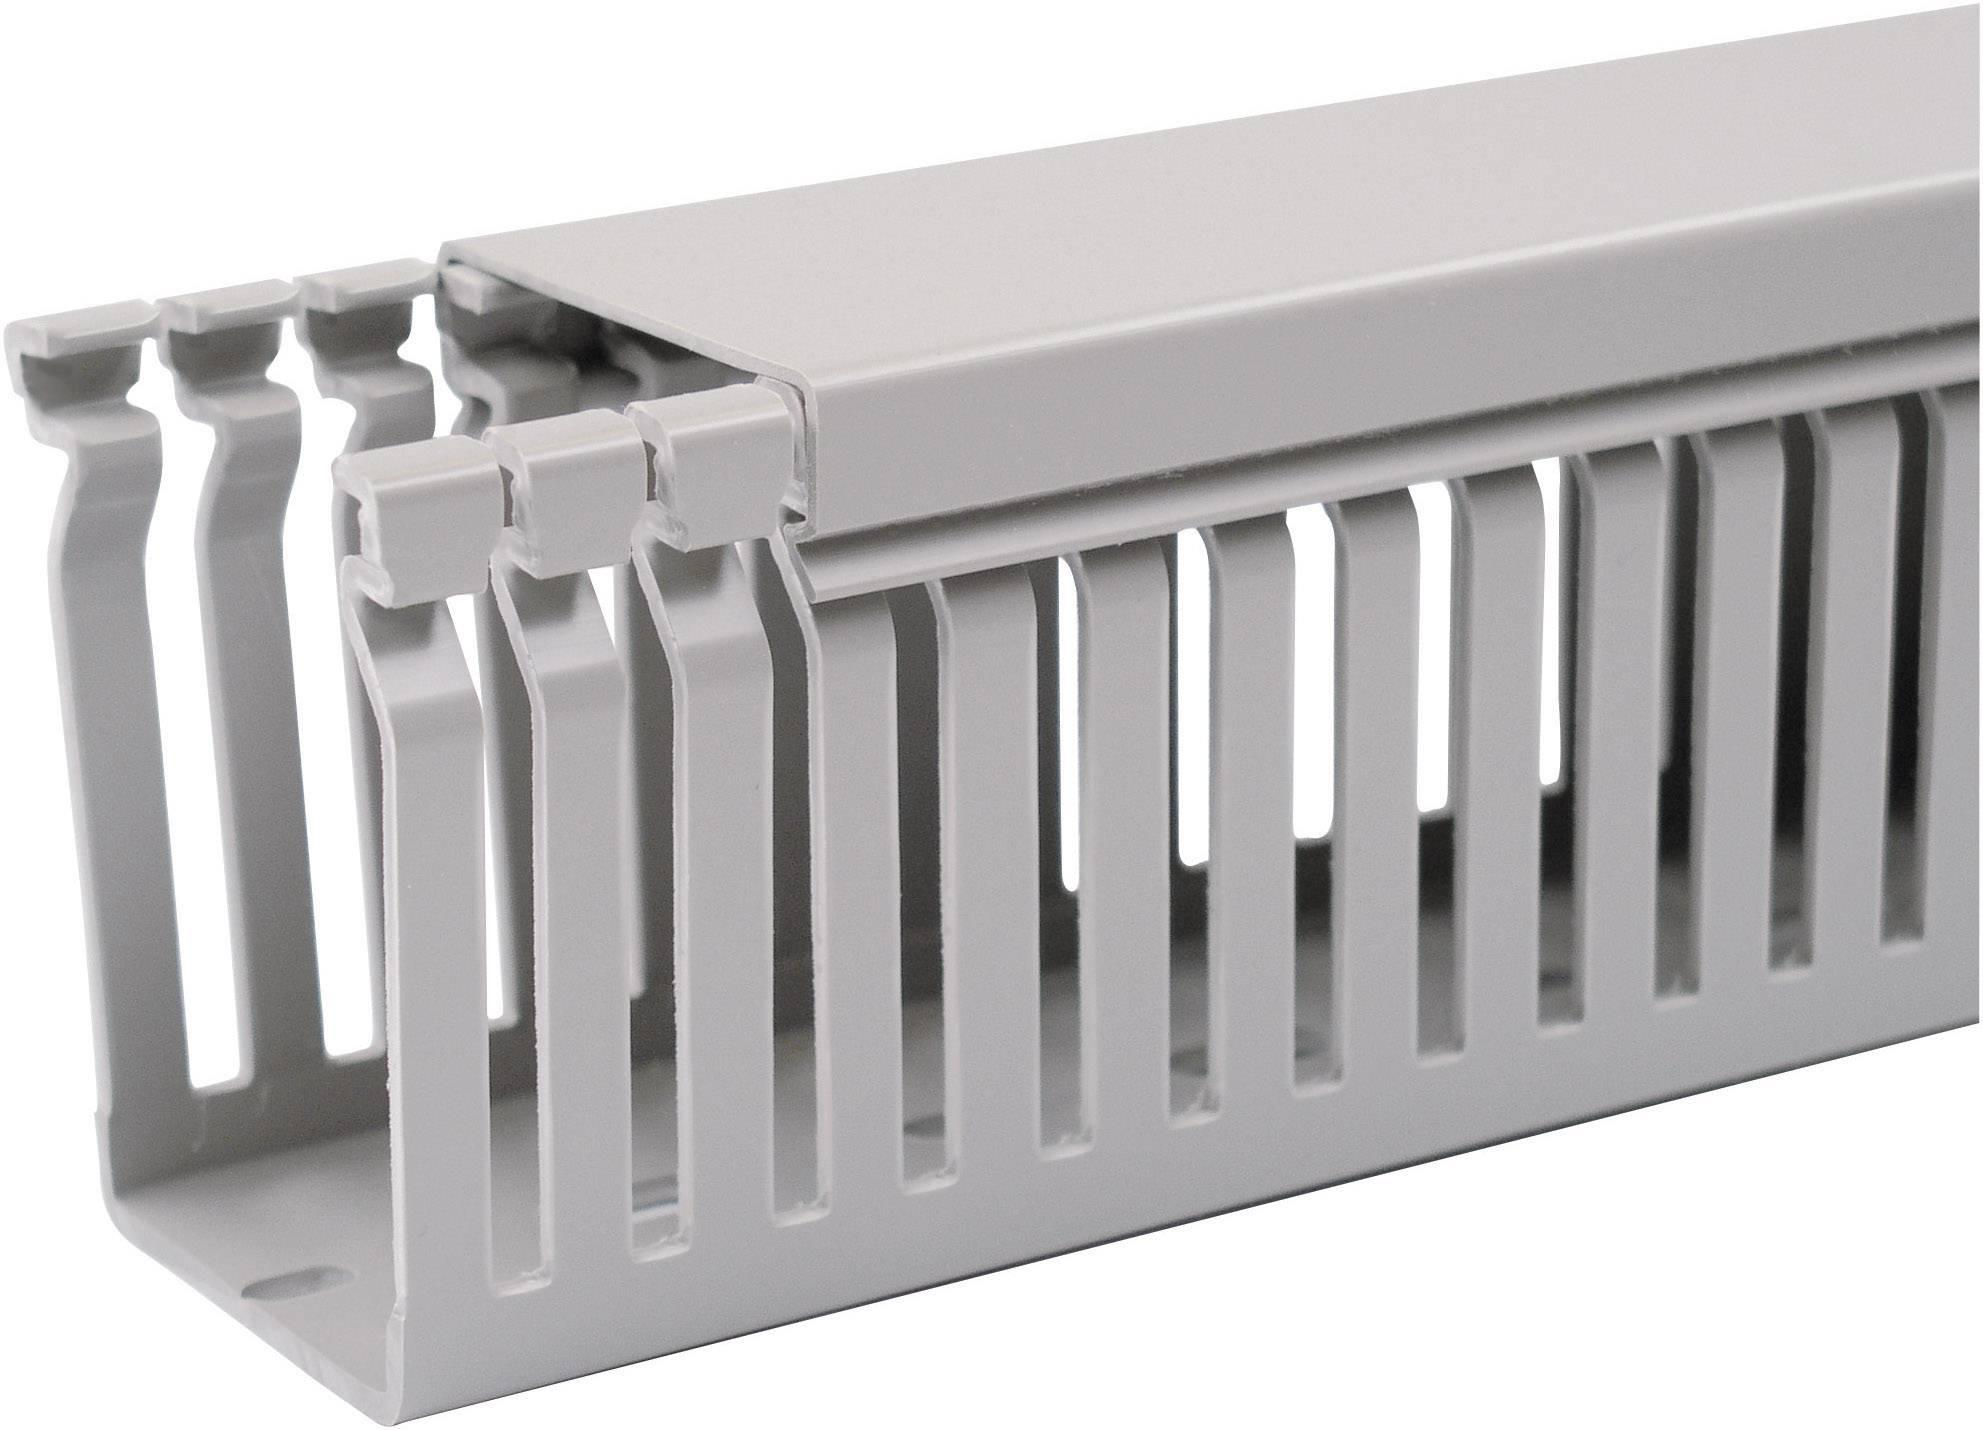 Elektroinstalační lišta OBO Bettermann, 6178035, 80x60 mm, 2 m, šedá